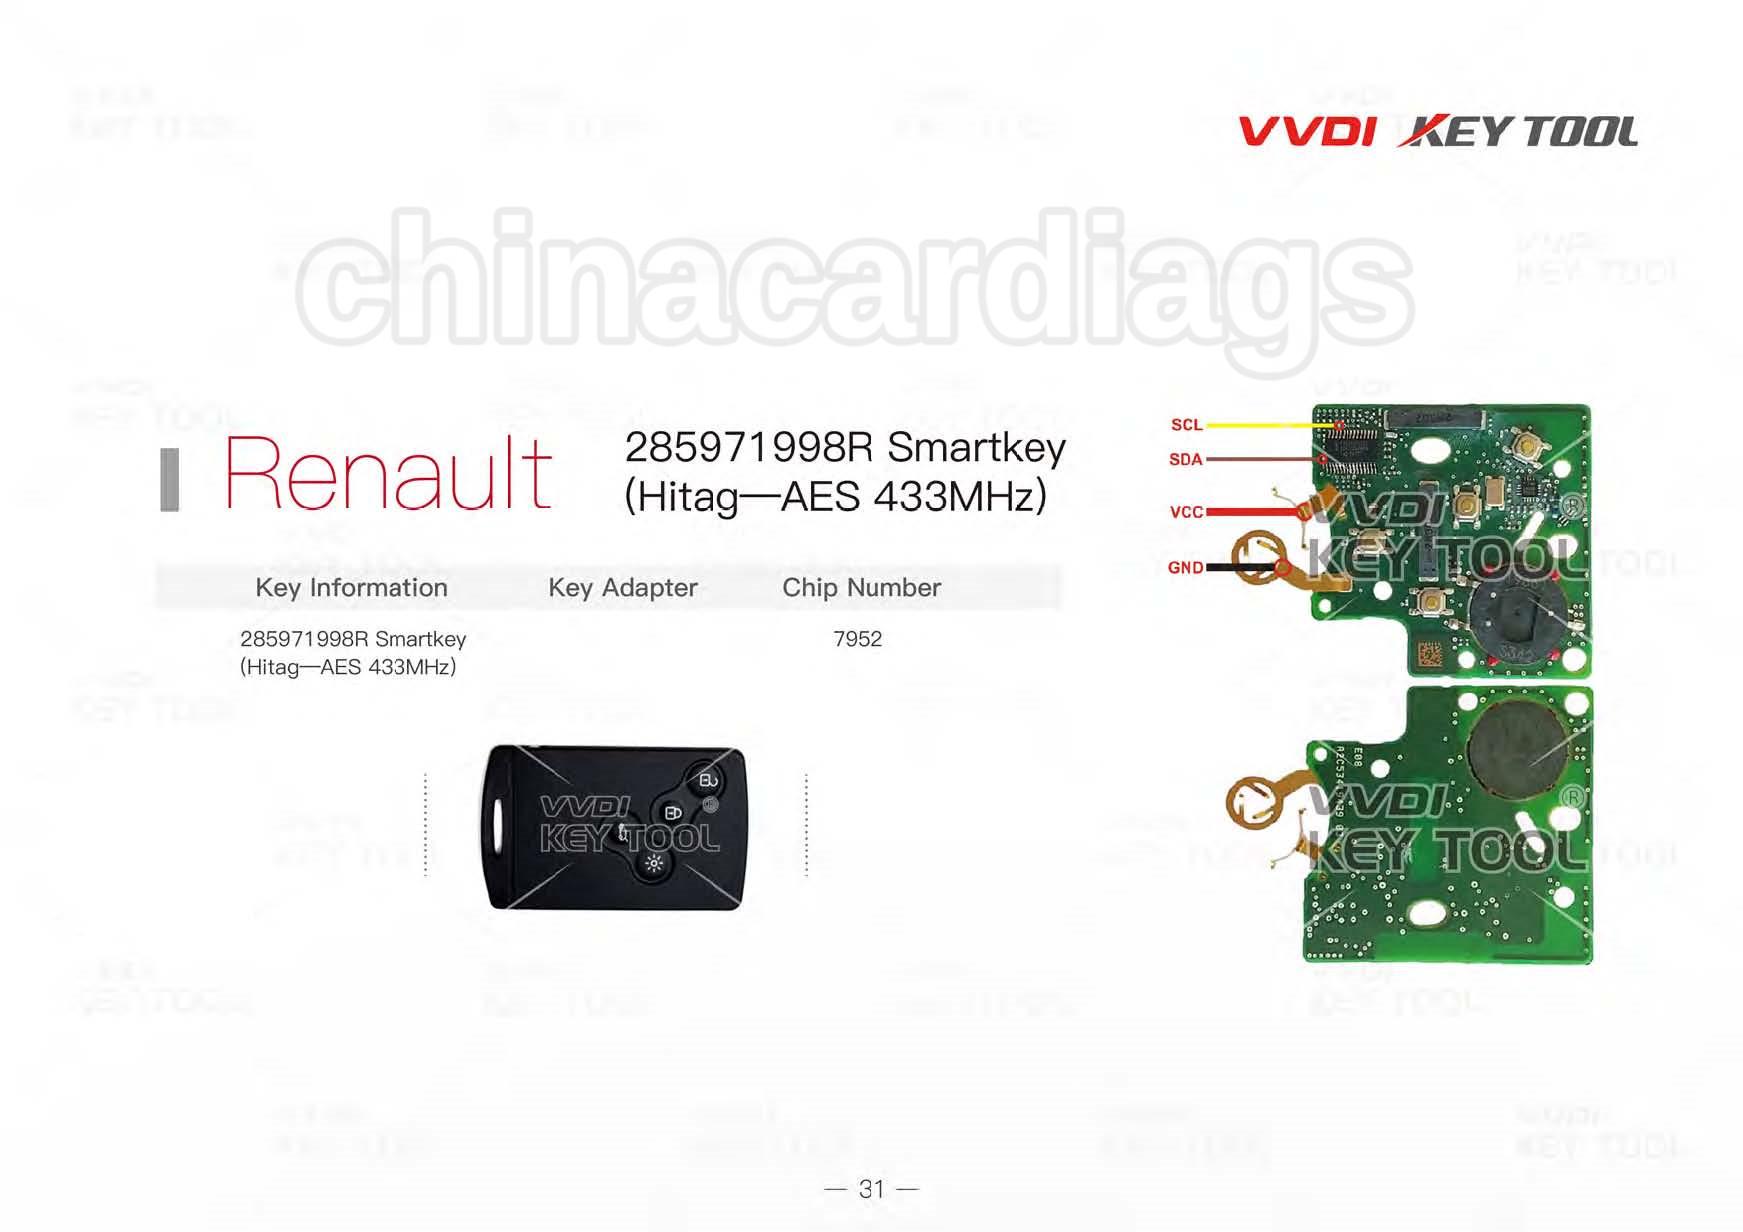 vvdi-key-tool-renew-diagram-31